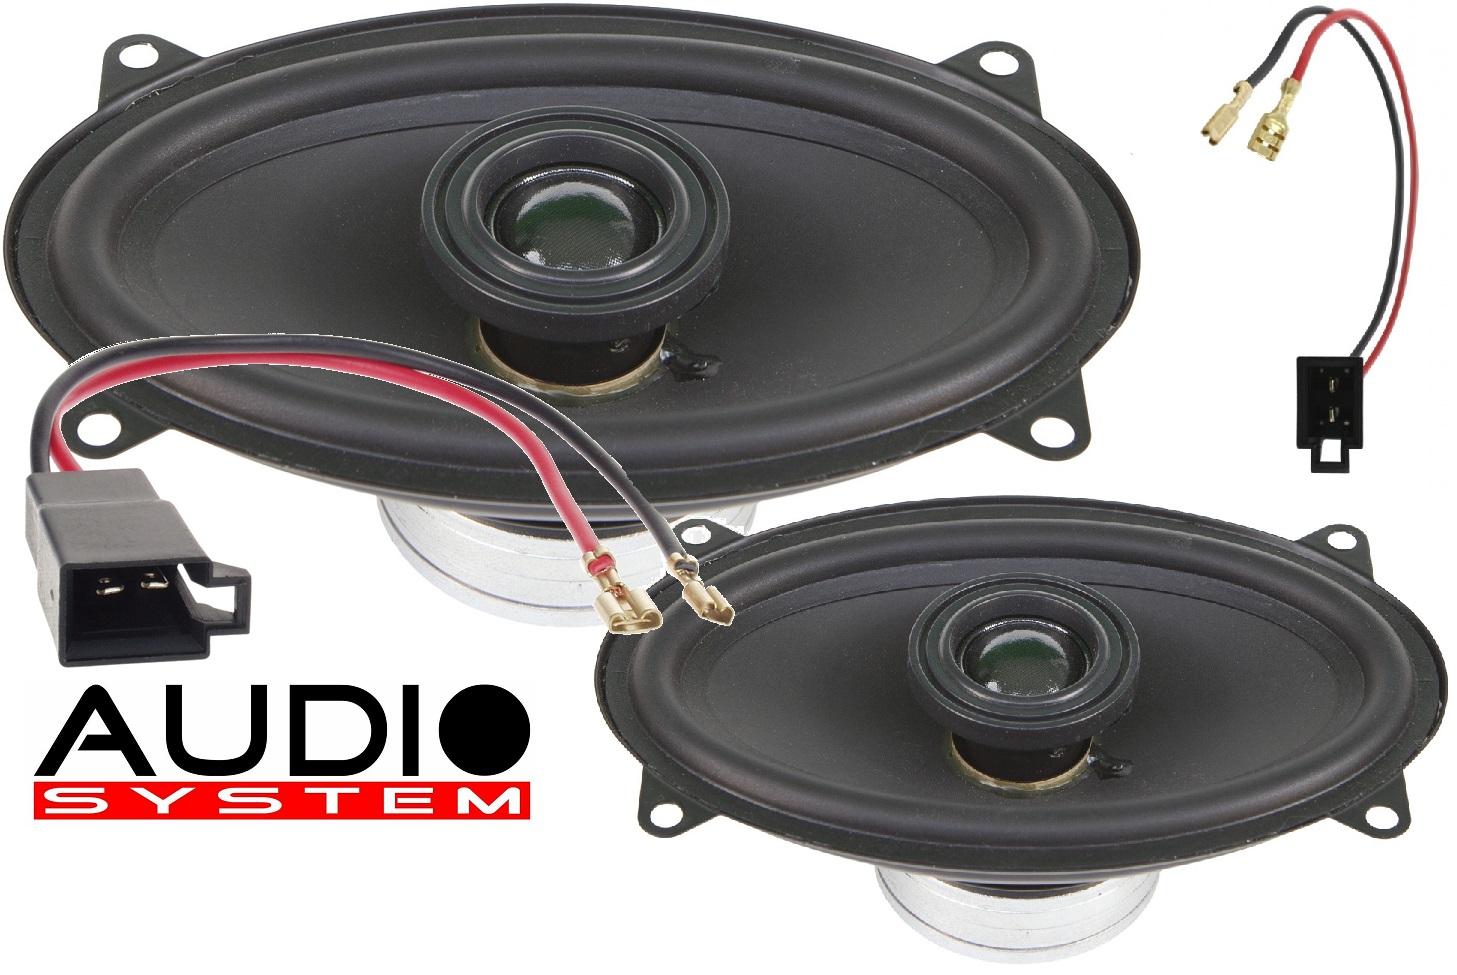 Audio System XCFIT VW PASSAT 3B EVO Lautsprecher X-SERIES 4x6 Neodym Spezial Coaxial System PASSAT 1 Paar